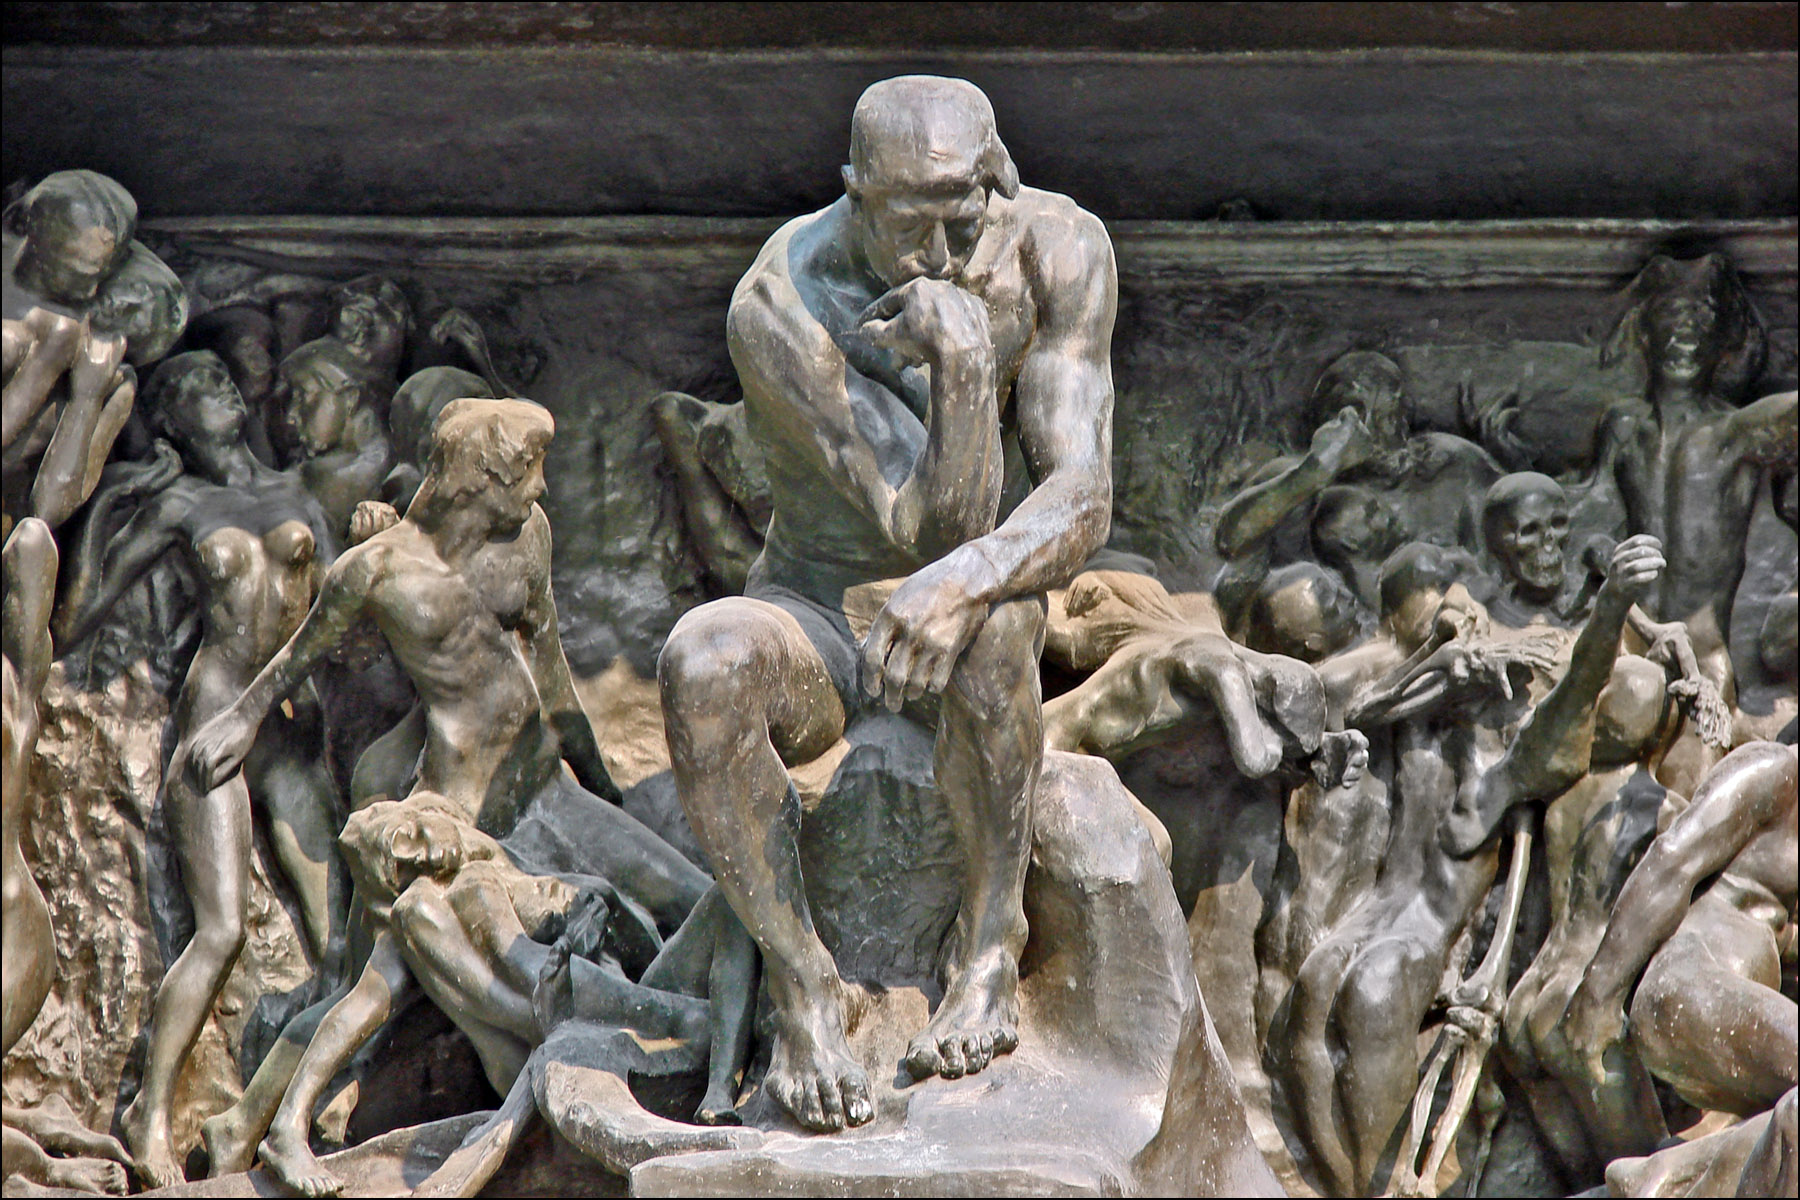 https://i1.wp.com/upload.wikimedia.org/wikipedia/commons/9/96/Le_penseur_de_la_Porte_de_lEnfer_%28mus%C3%A9e_Rodin%29_%284528252054%29.jpg